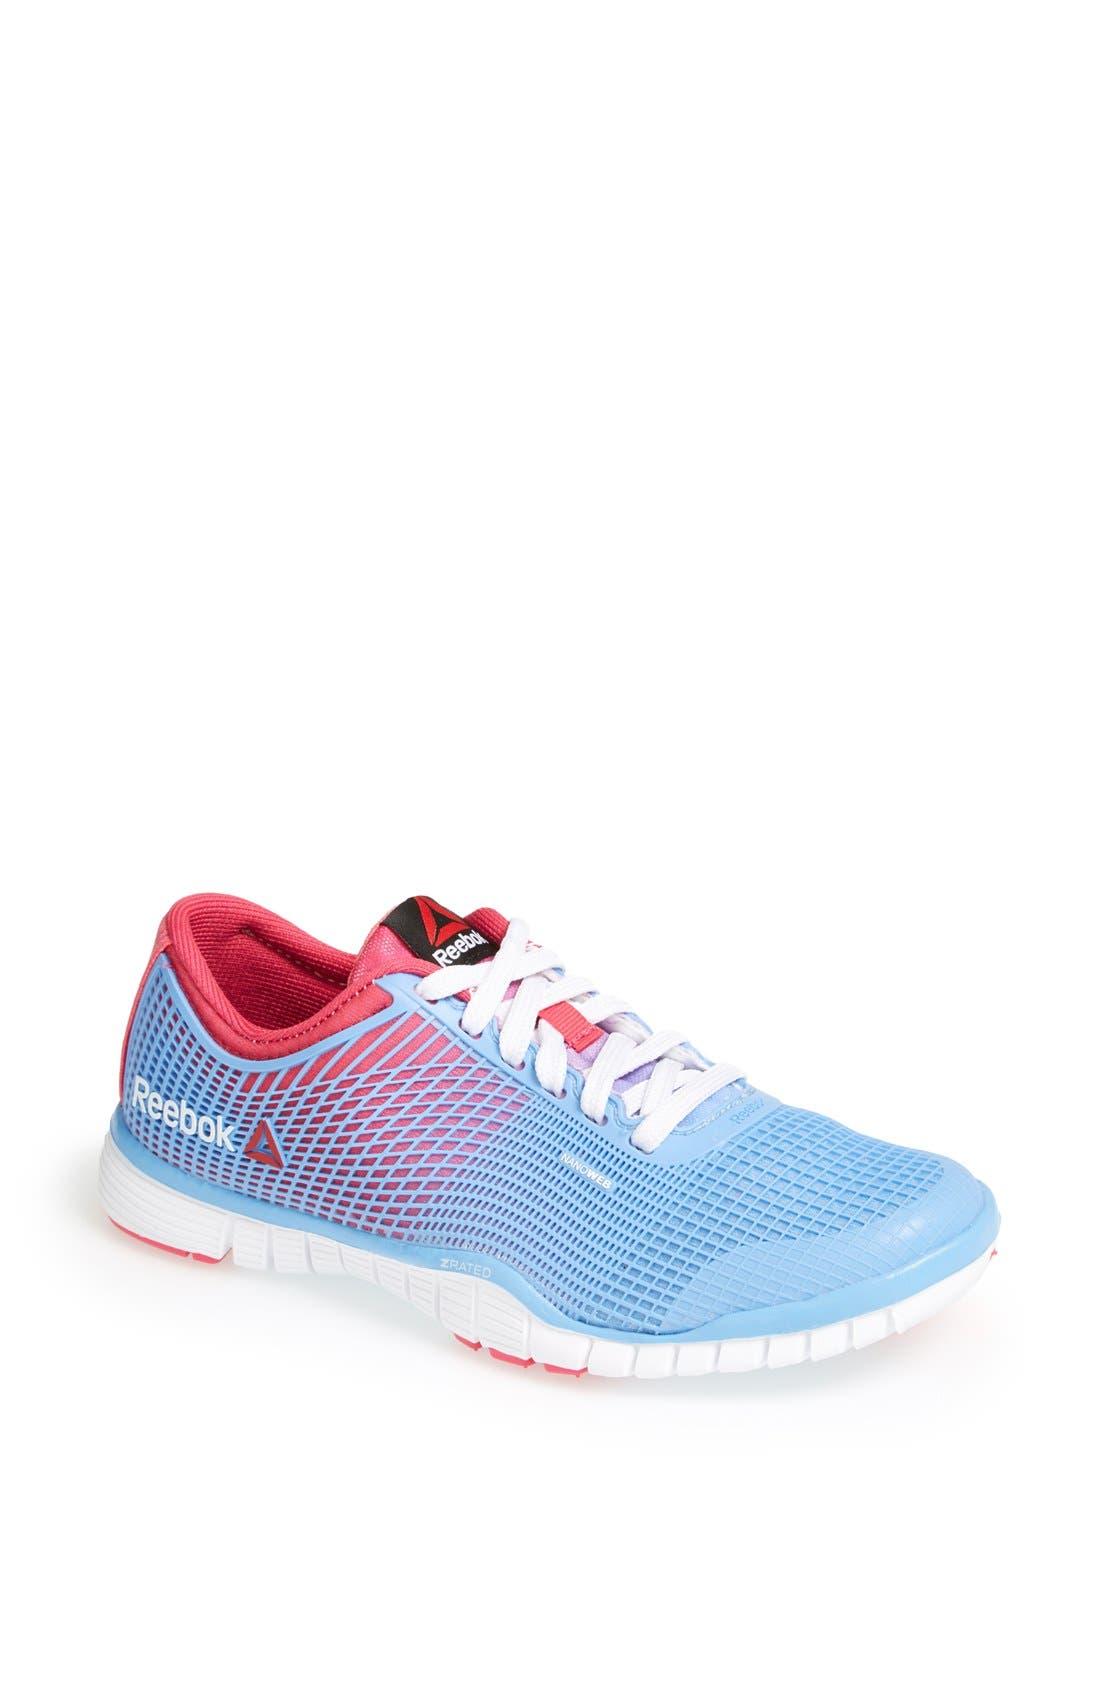 Alternate Image 1 Selected - Reebok 'Quick' Training Shoes (Women)